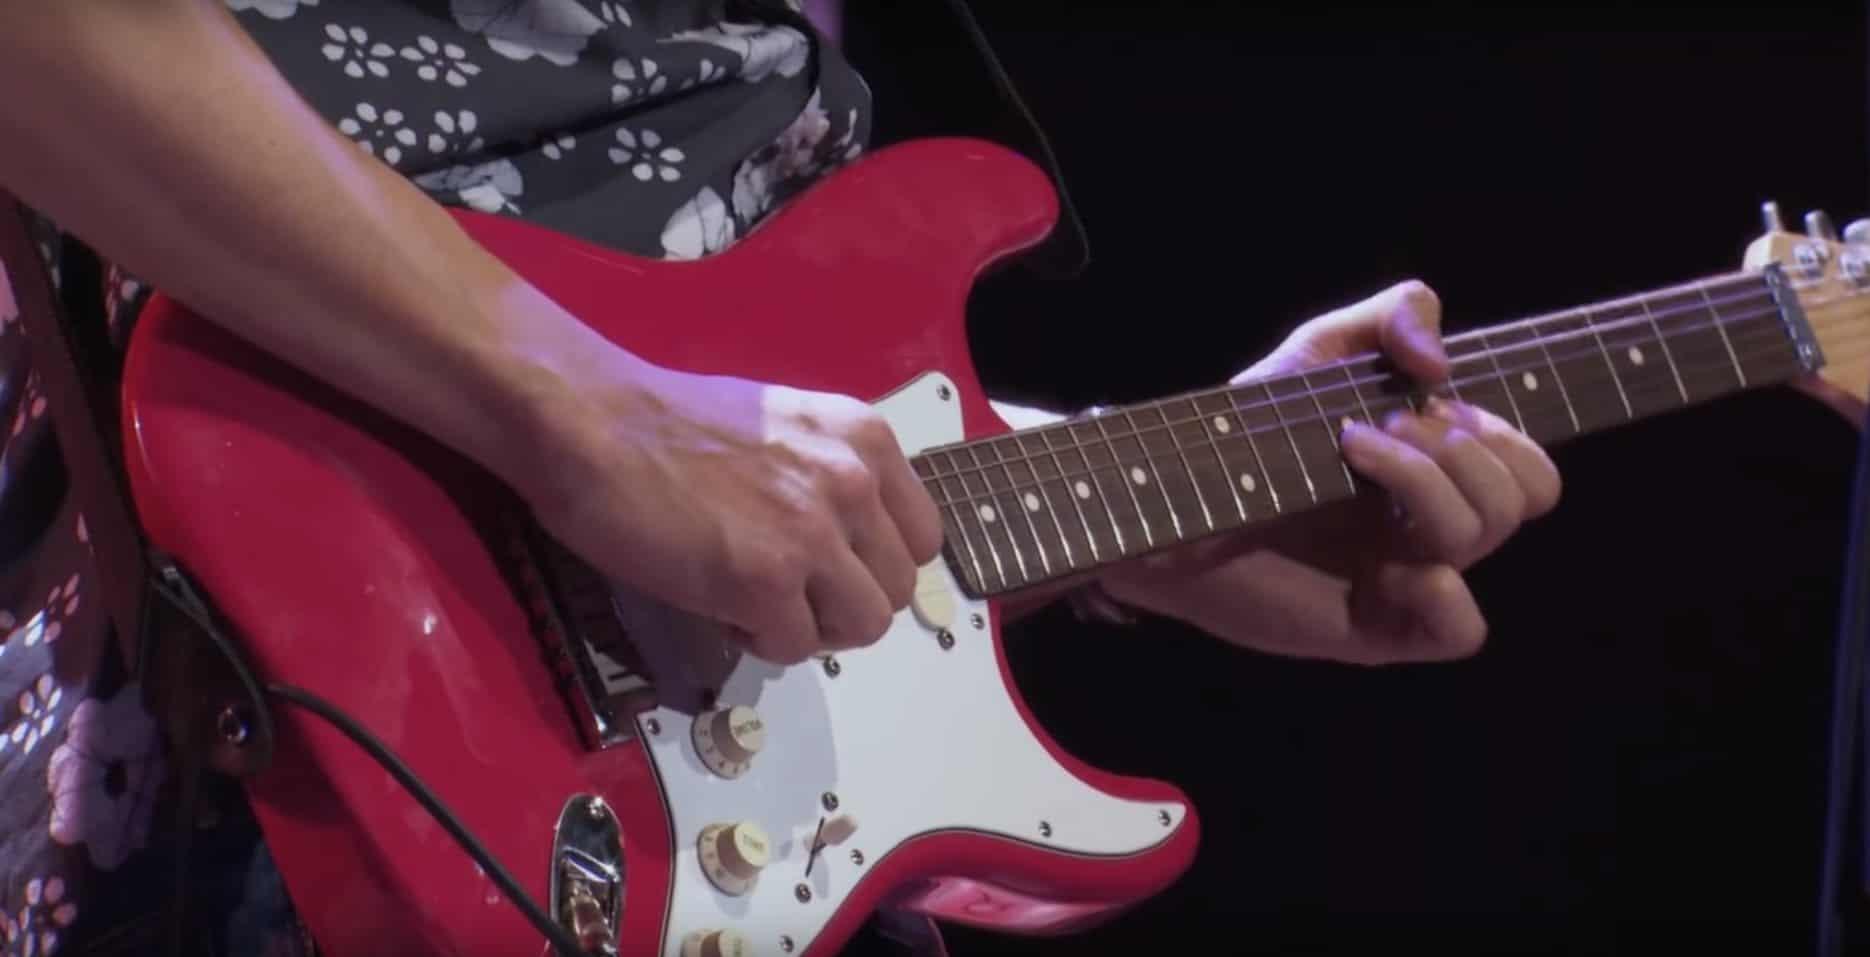 John Mayer S Guitars And Gear